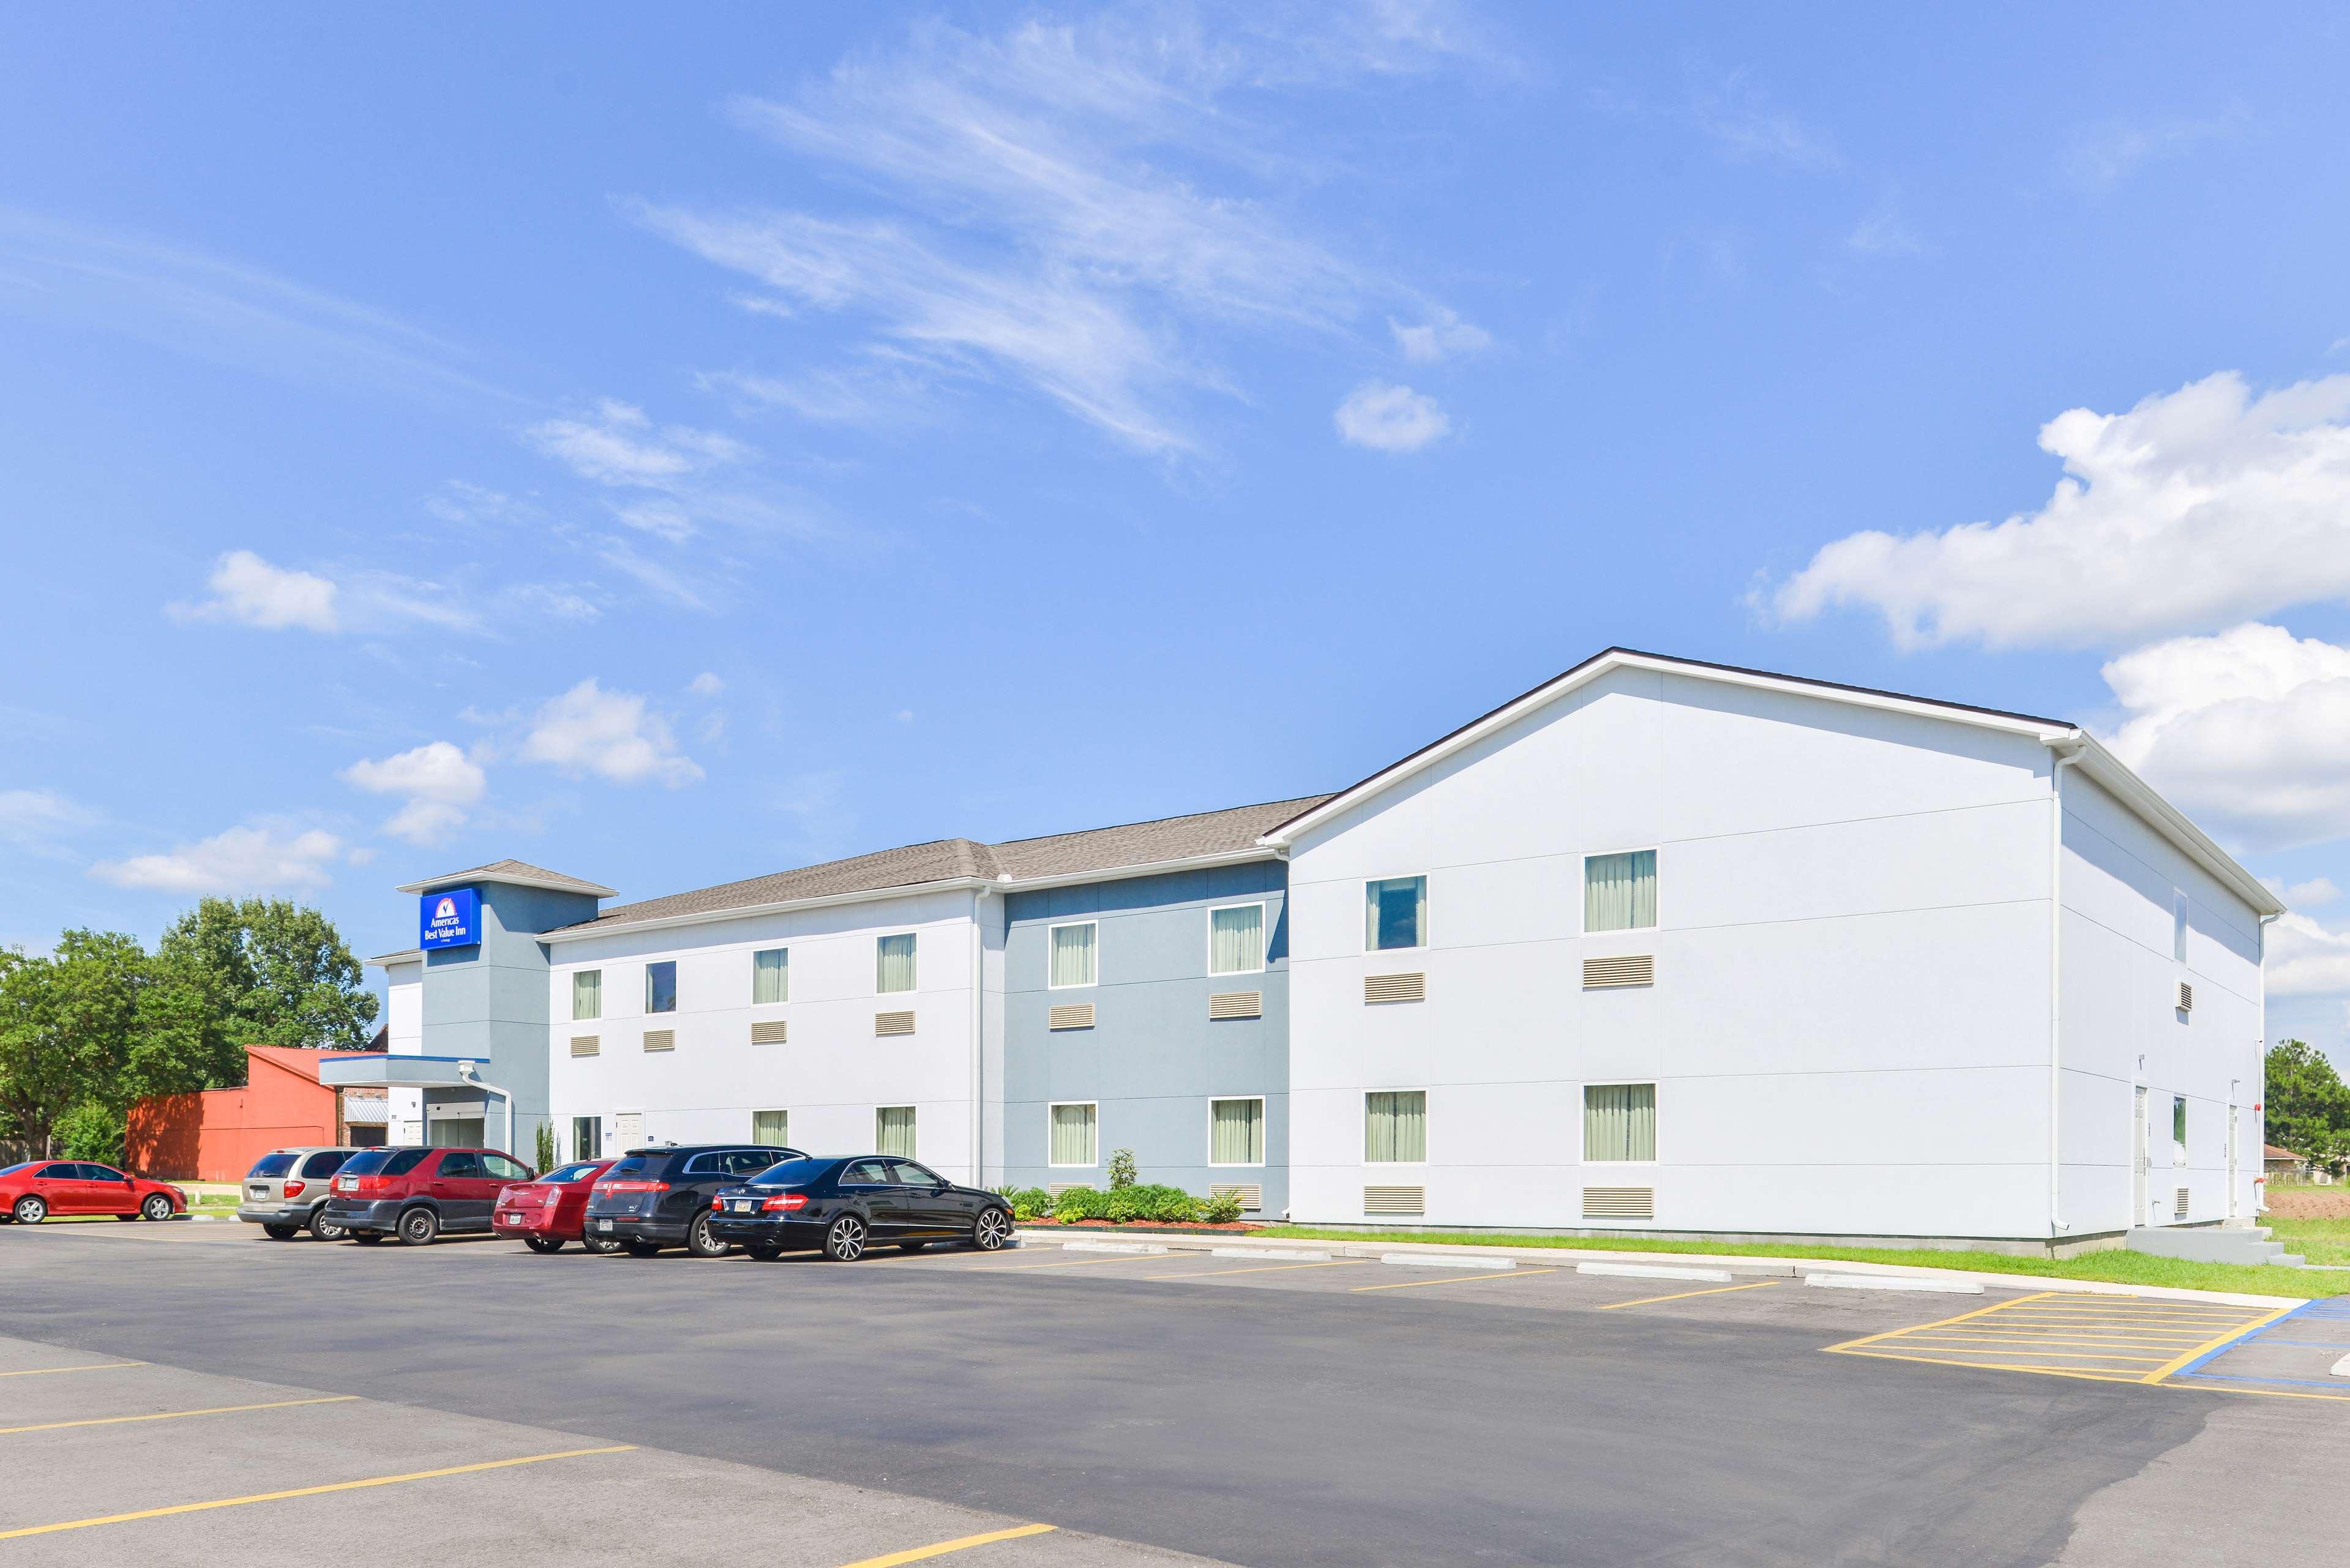 Americas Best Value Inn - Baton Rouge / College Drive image 1